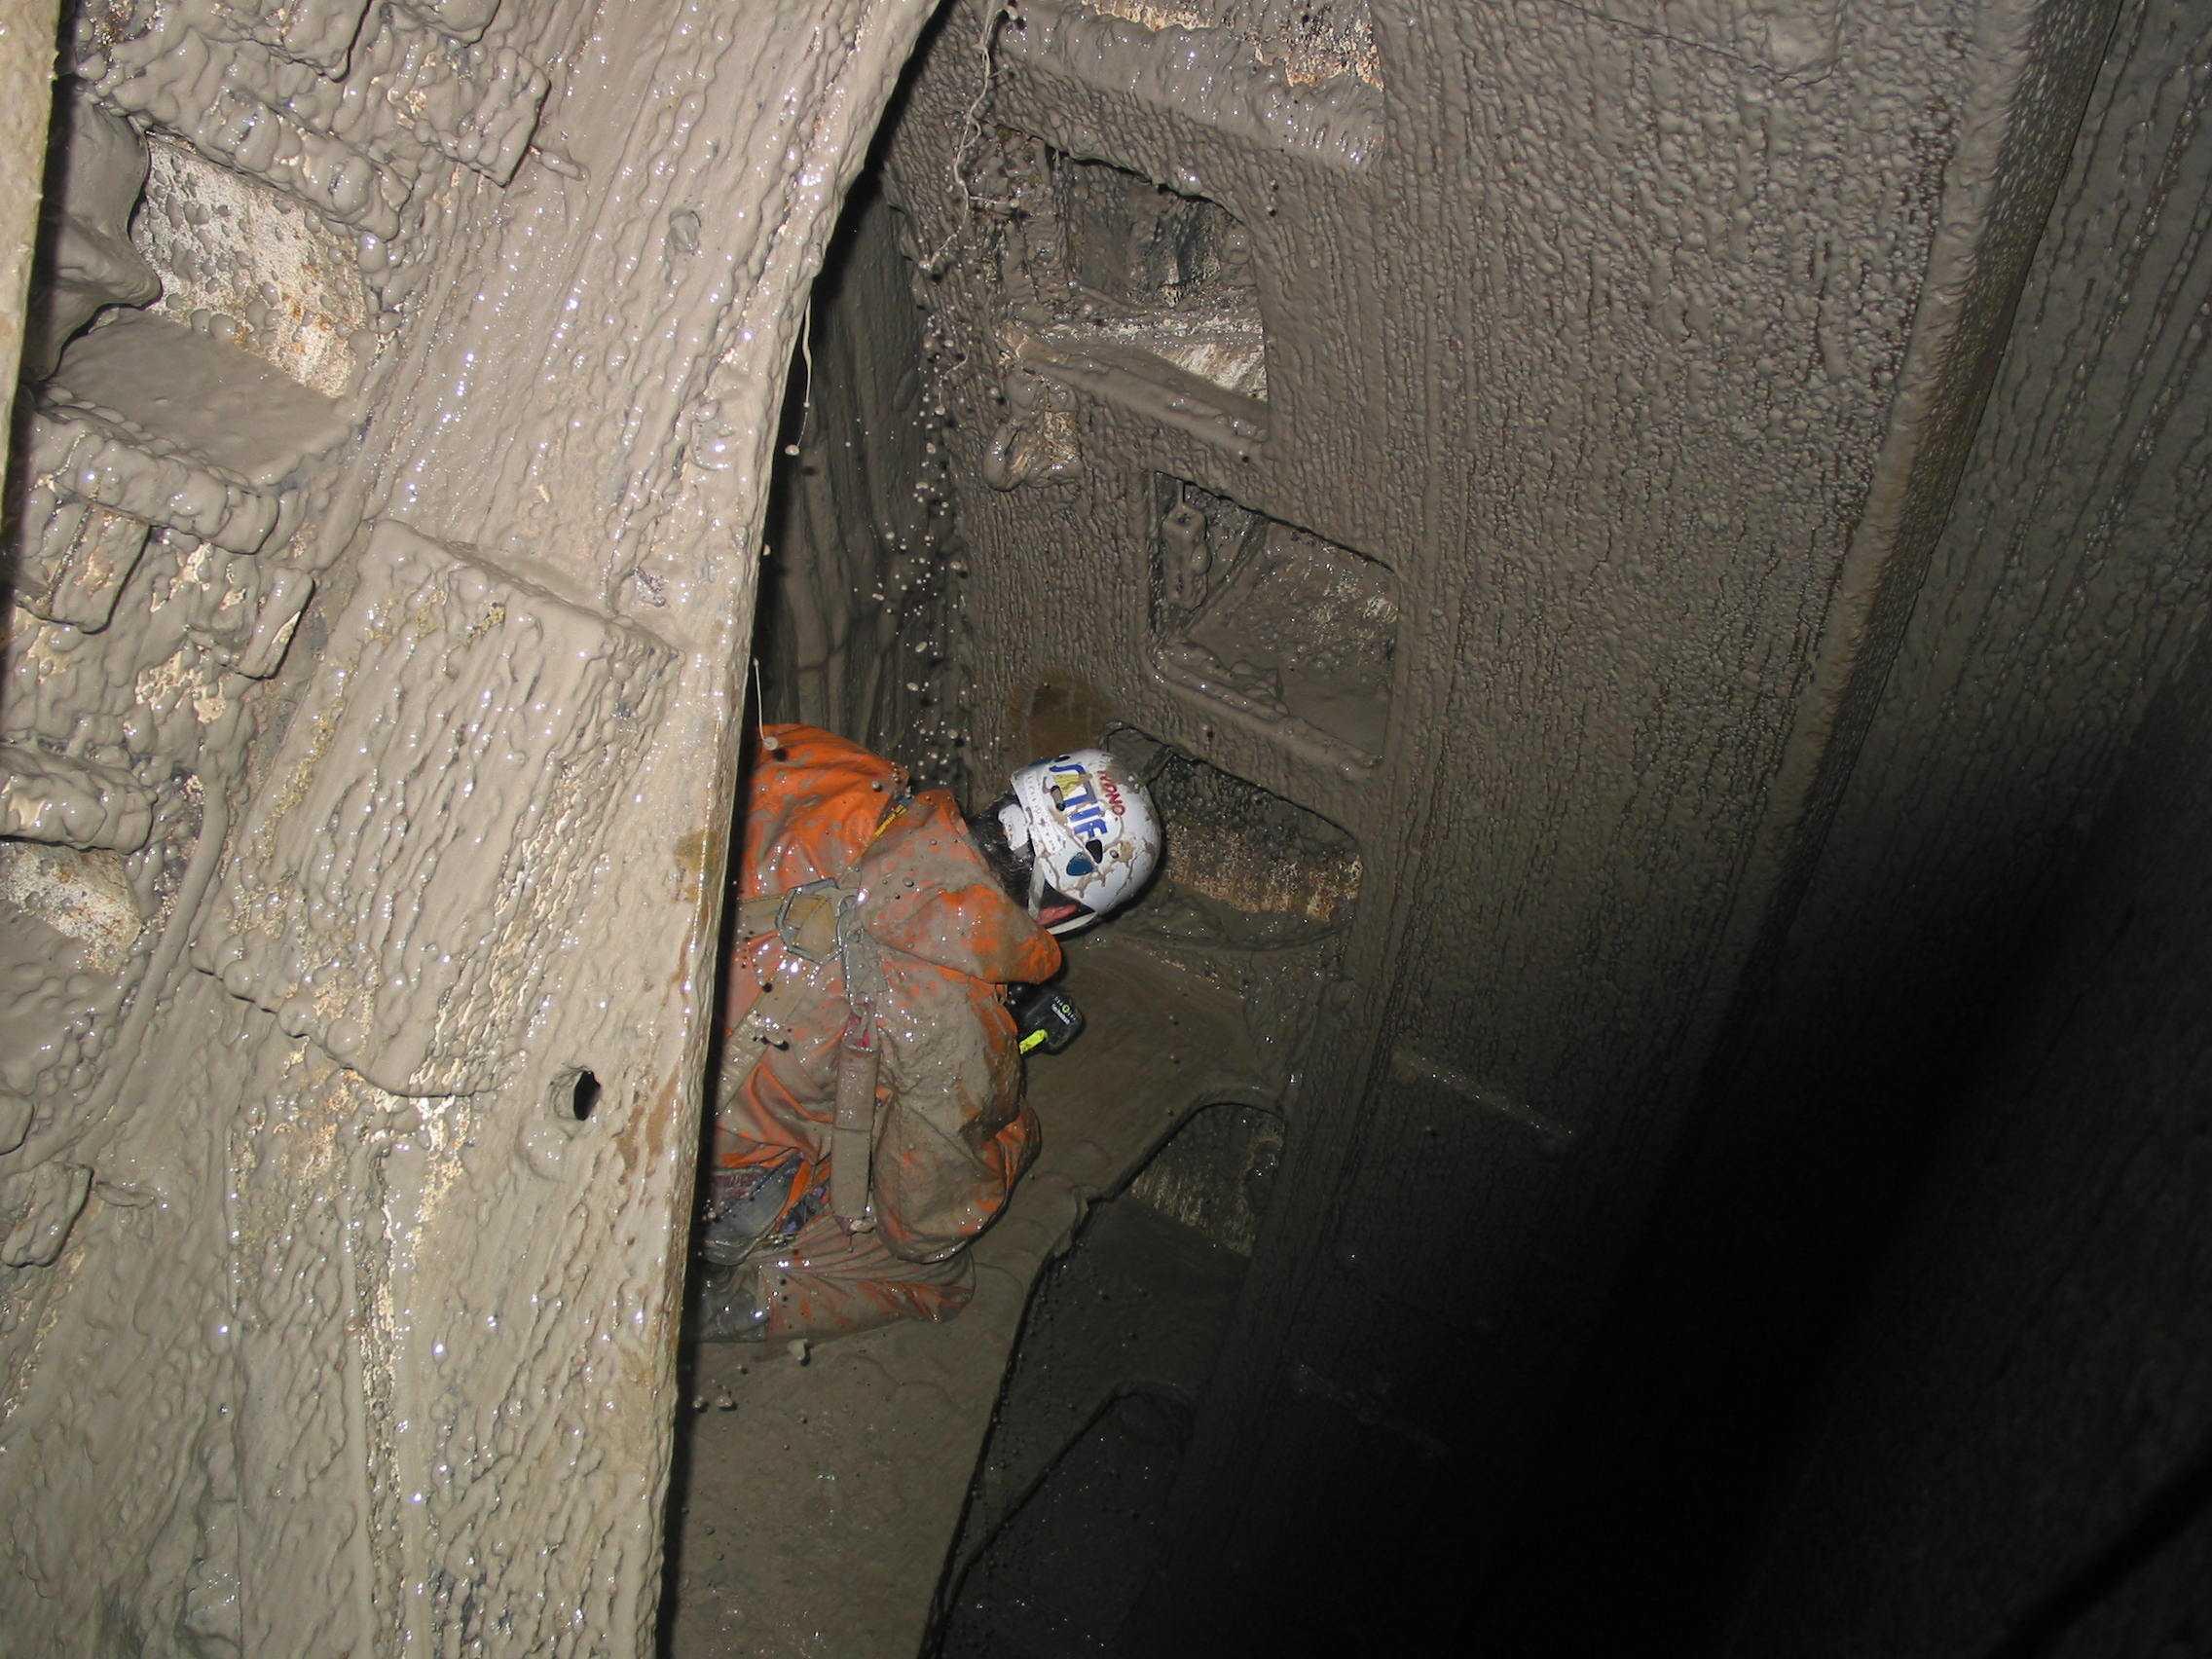 Travaux hyperbares - Interventions en chambre d'attaque de tunnelier